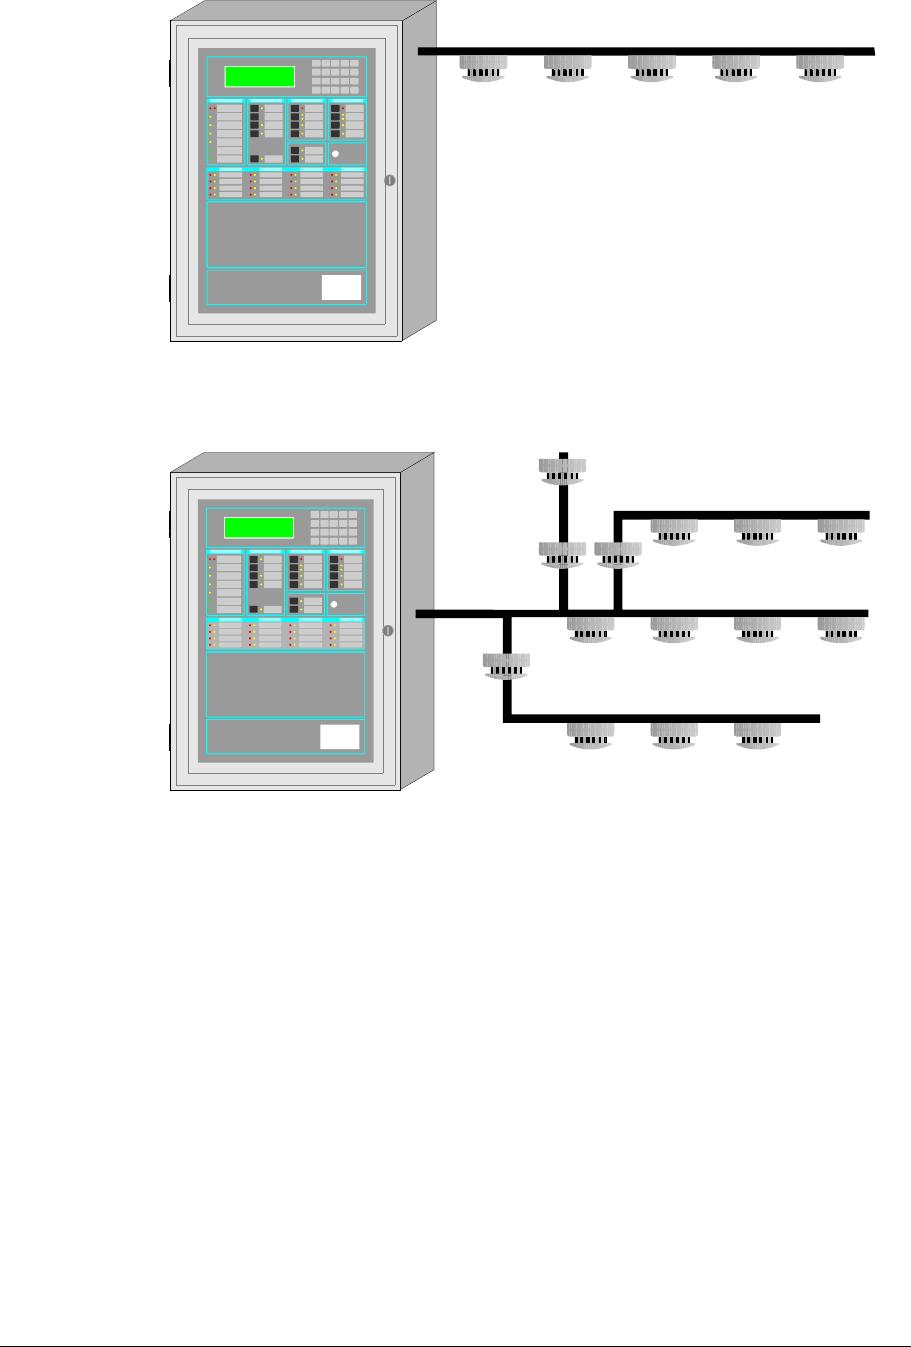 manual aritech fp fr1100 series page 25 of 60 english rh libble eu Aritech Z900 Aritech Motion Detectors